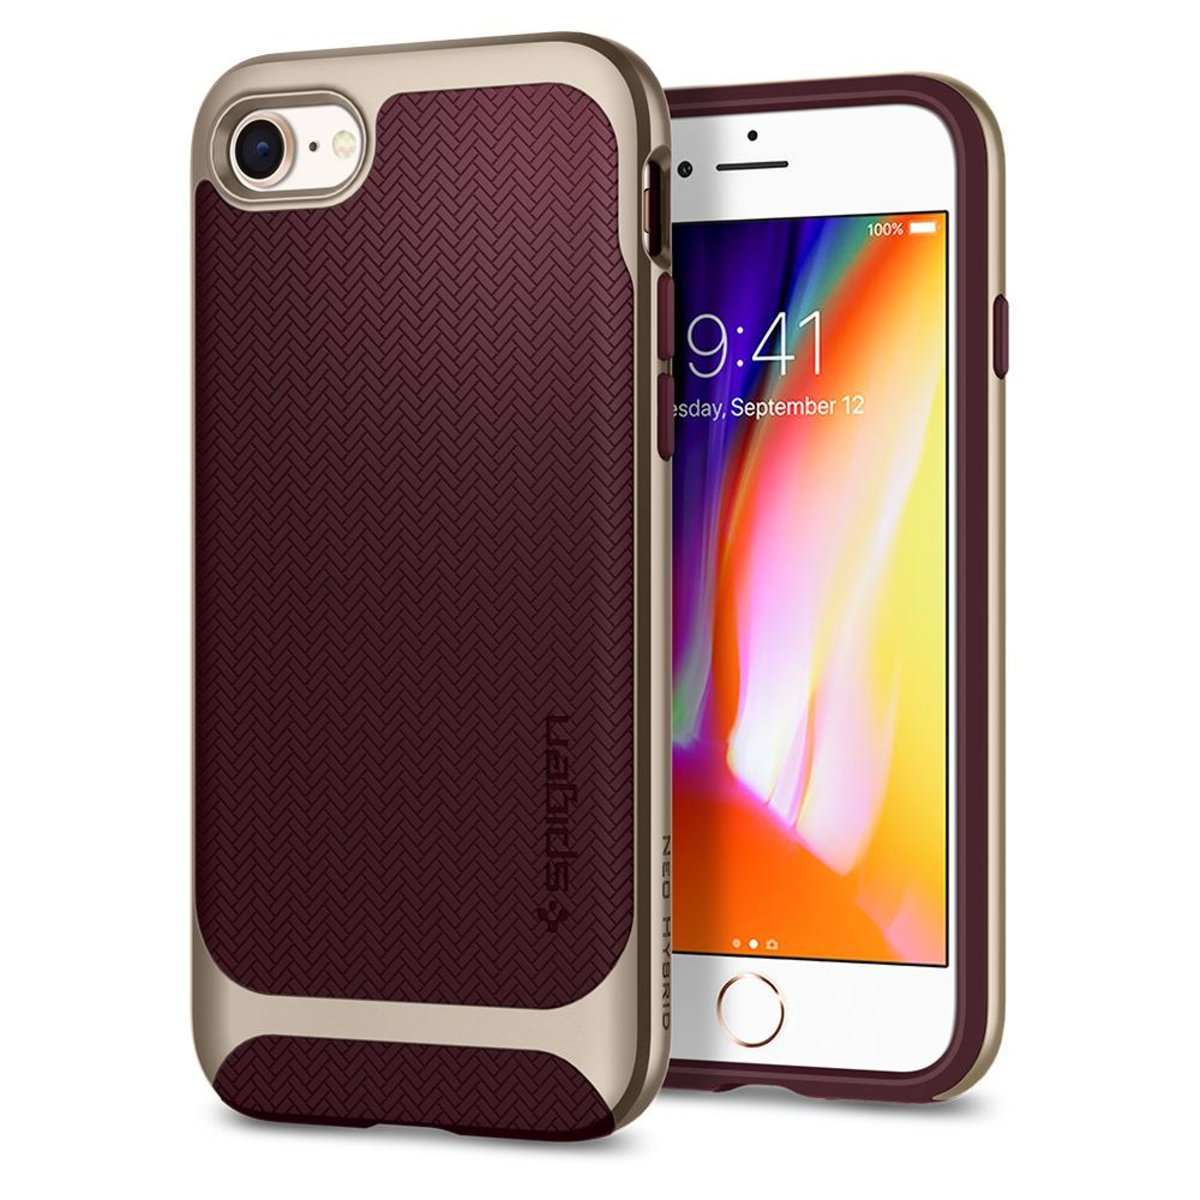 iPhone 8 Plus/7 Plus Case Neo Hybrid Herringbone - Burgundy Red